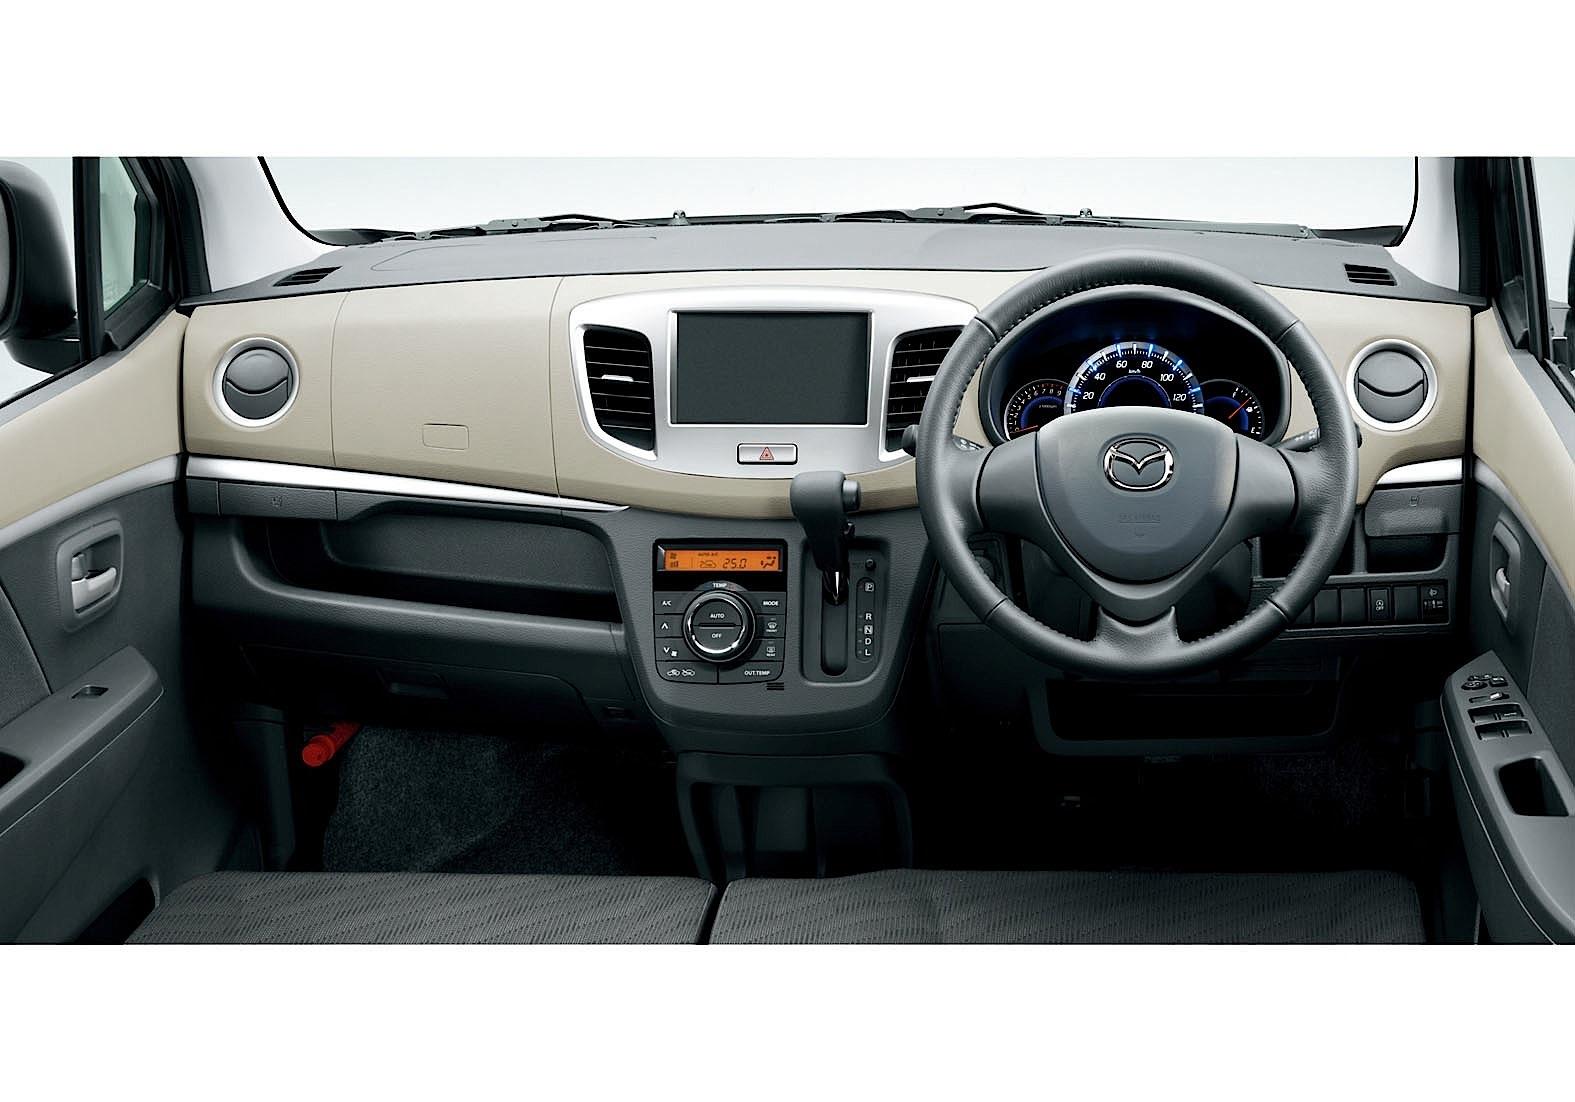 Mazda Flair I 2012 - 2014 Microvan #5